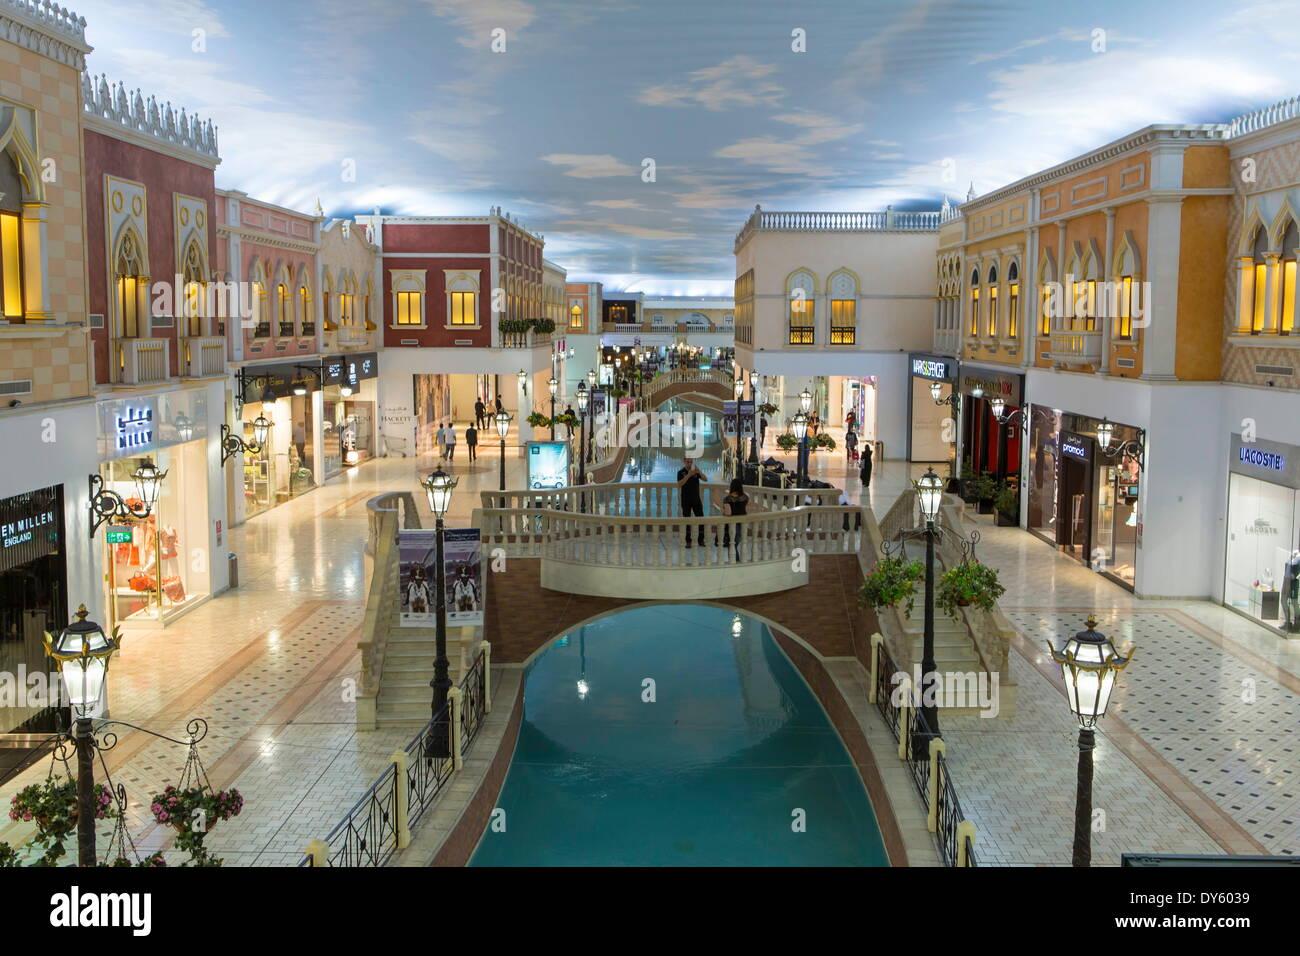 interior villaggio mall doha qatar middle east stock photo 68358621 alamy. Black Bedroom Furniture Sets. Home Design Ideas